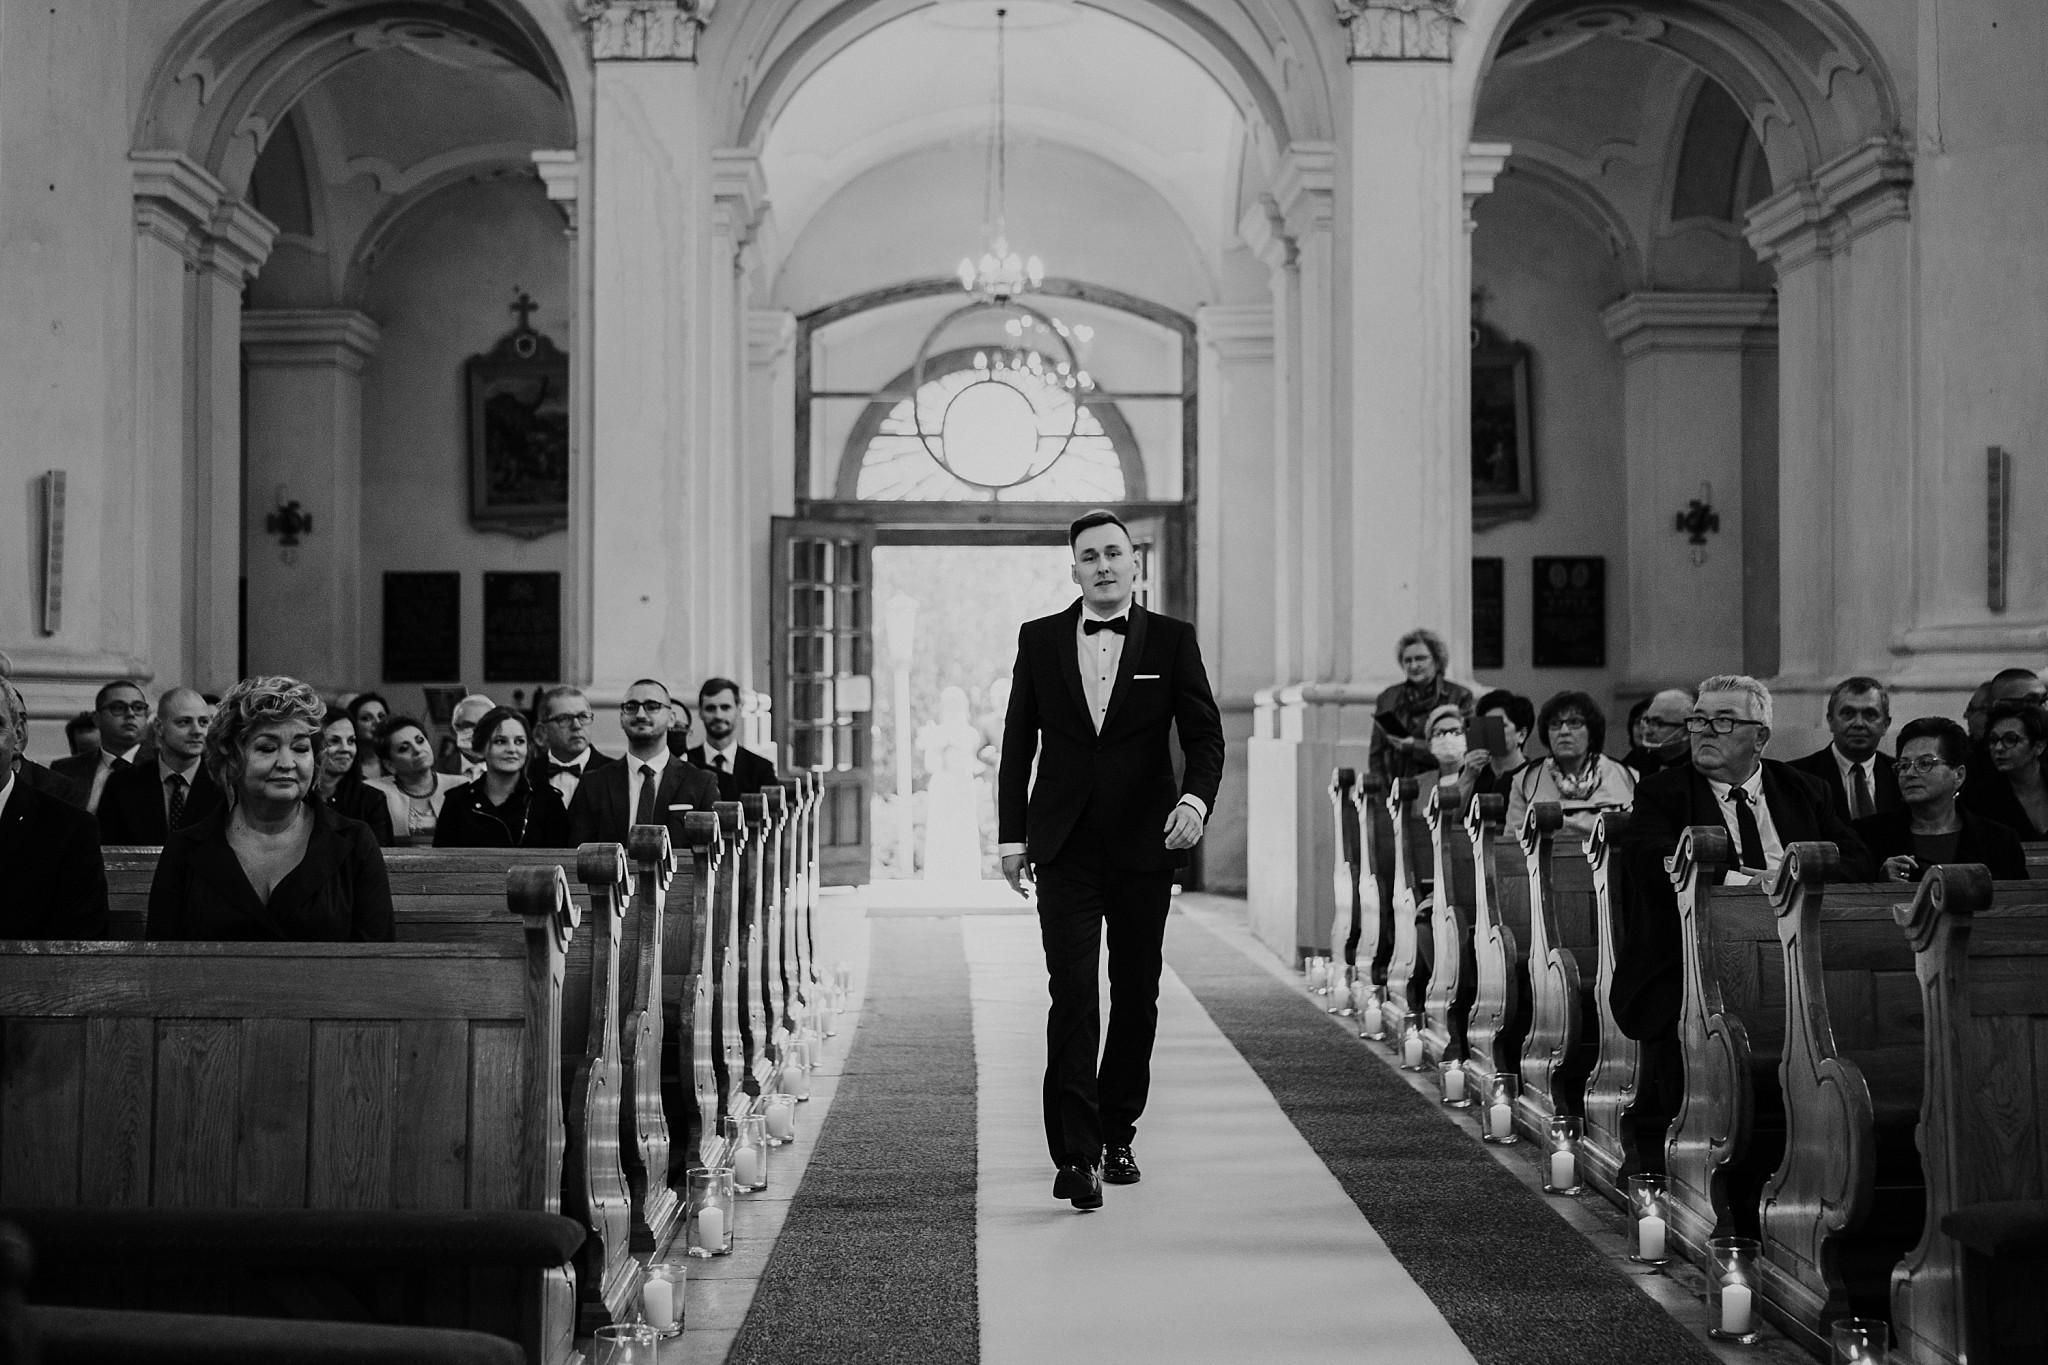 fotograf poznan wesele dobra truskawka piekne wesele pod poznaniem wesele w dobrej truskawce piekna para mloda slub marzen slub koronawirus slub listopad wesele koronawirus 143